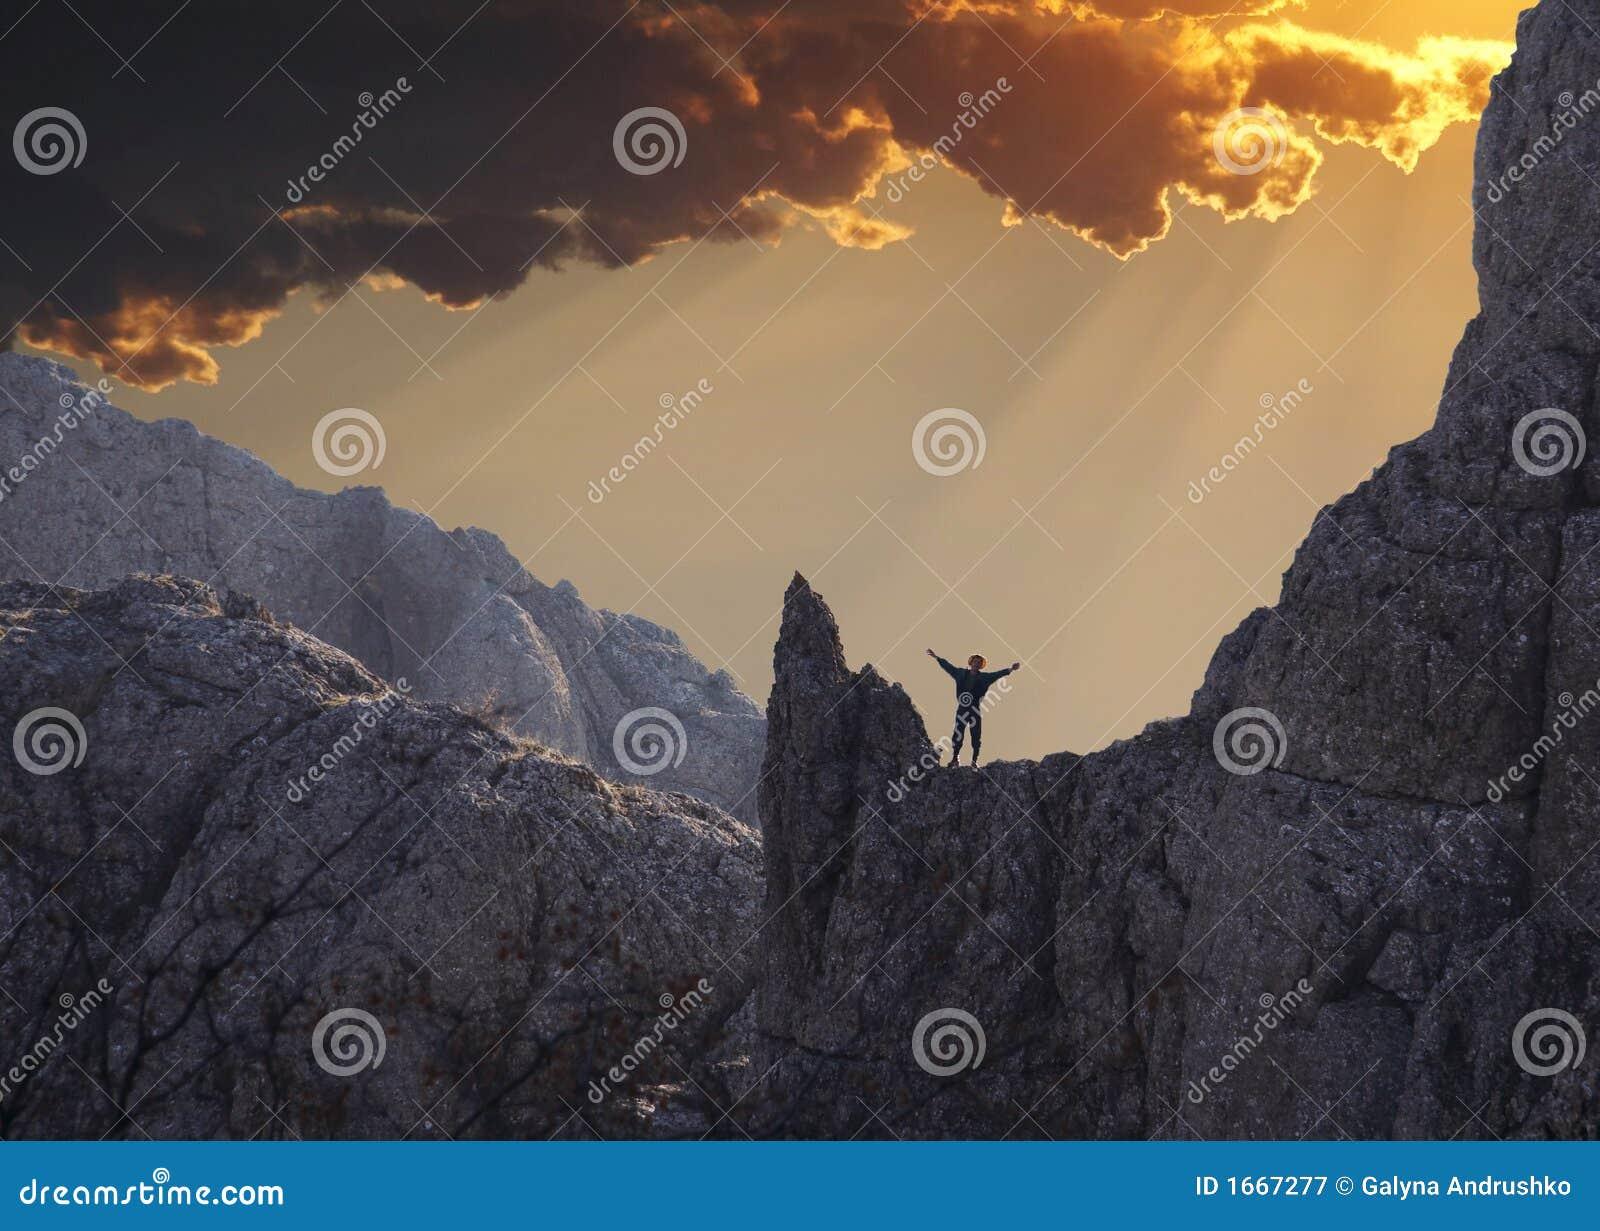 Happiness climber on sunset